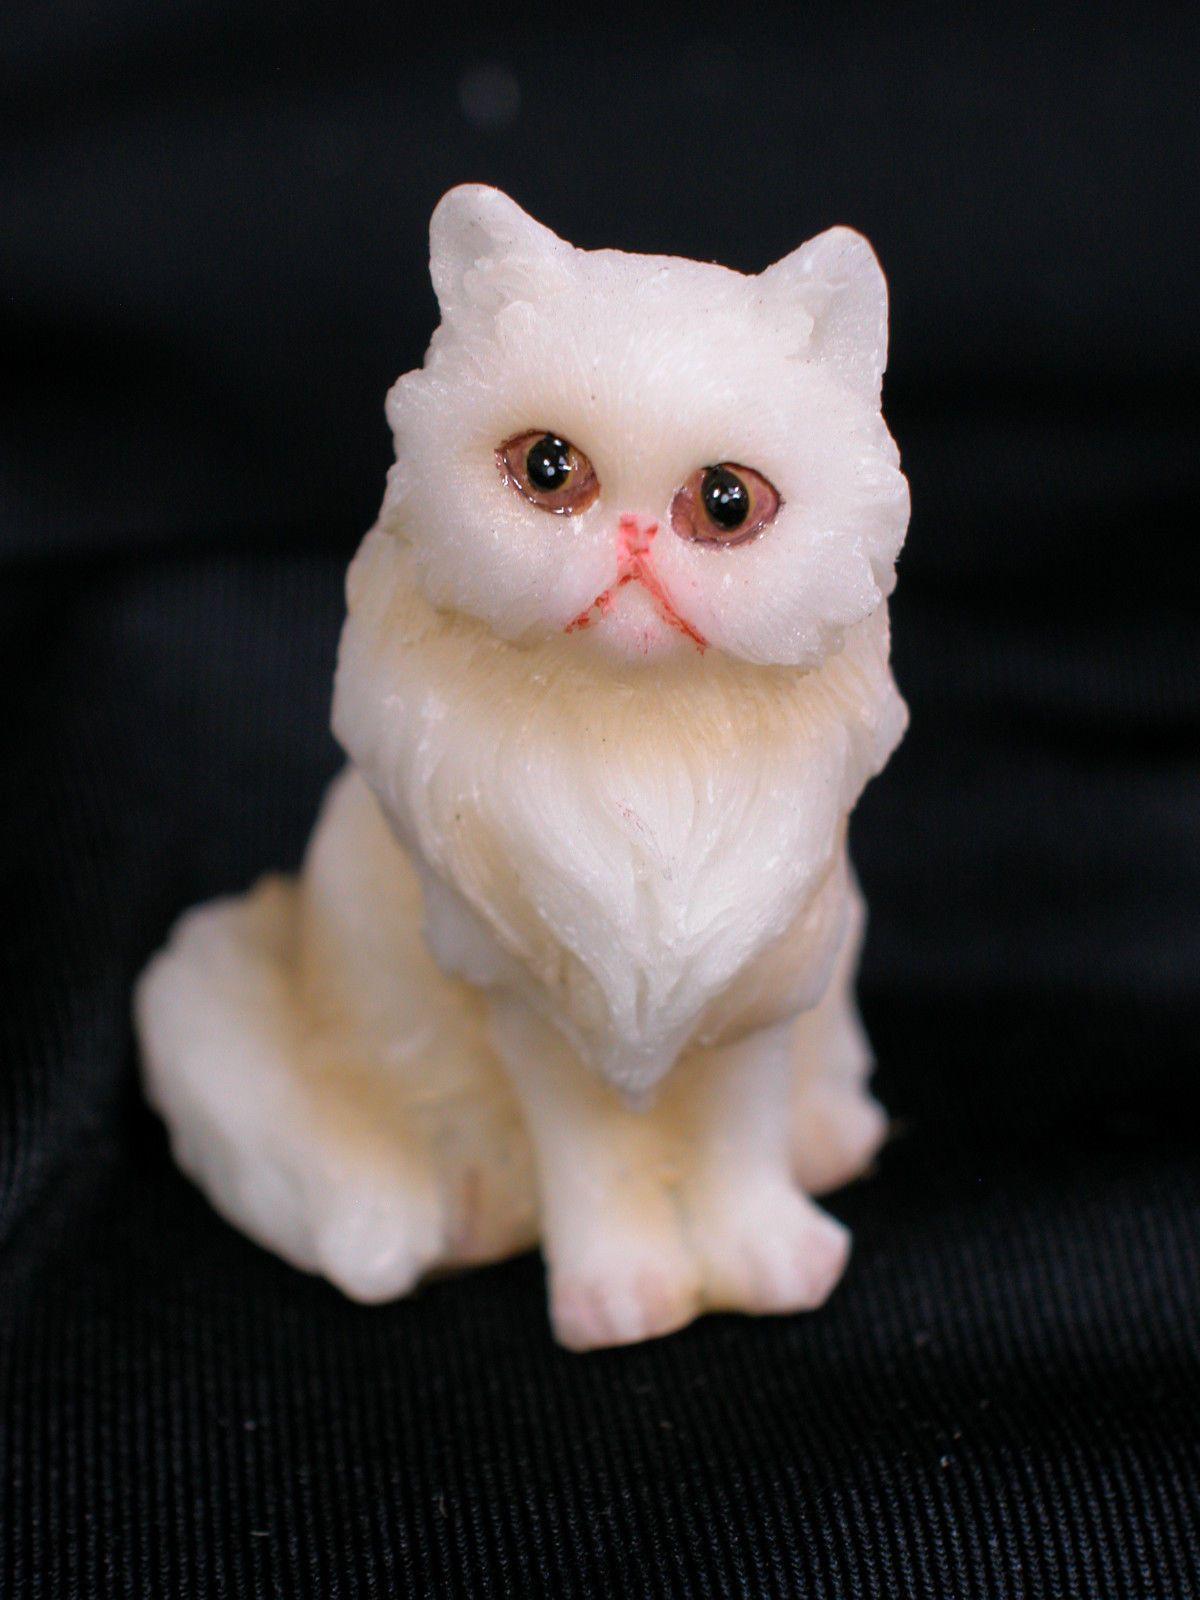 Details about Heidi Ott Dollhouse Miniature Animal Persian Cat